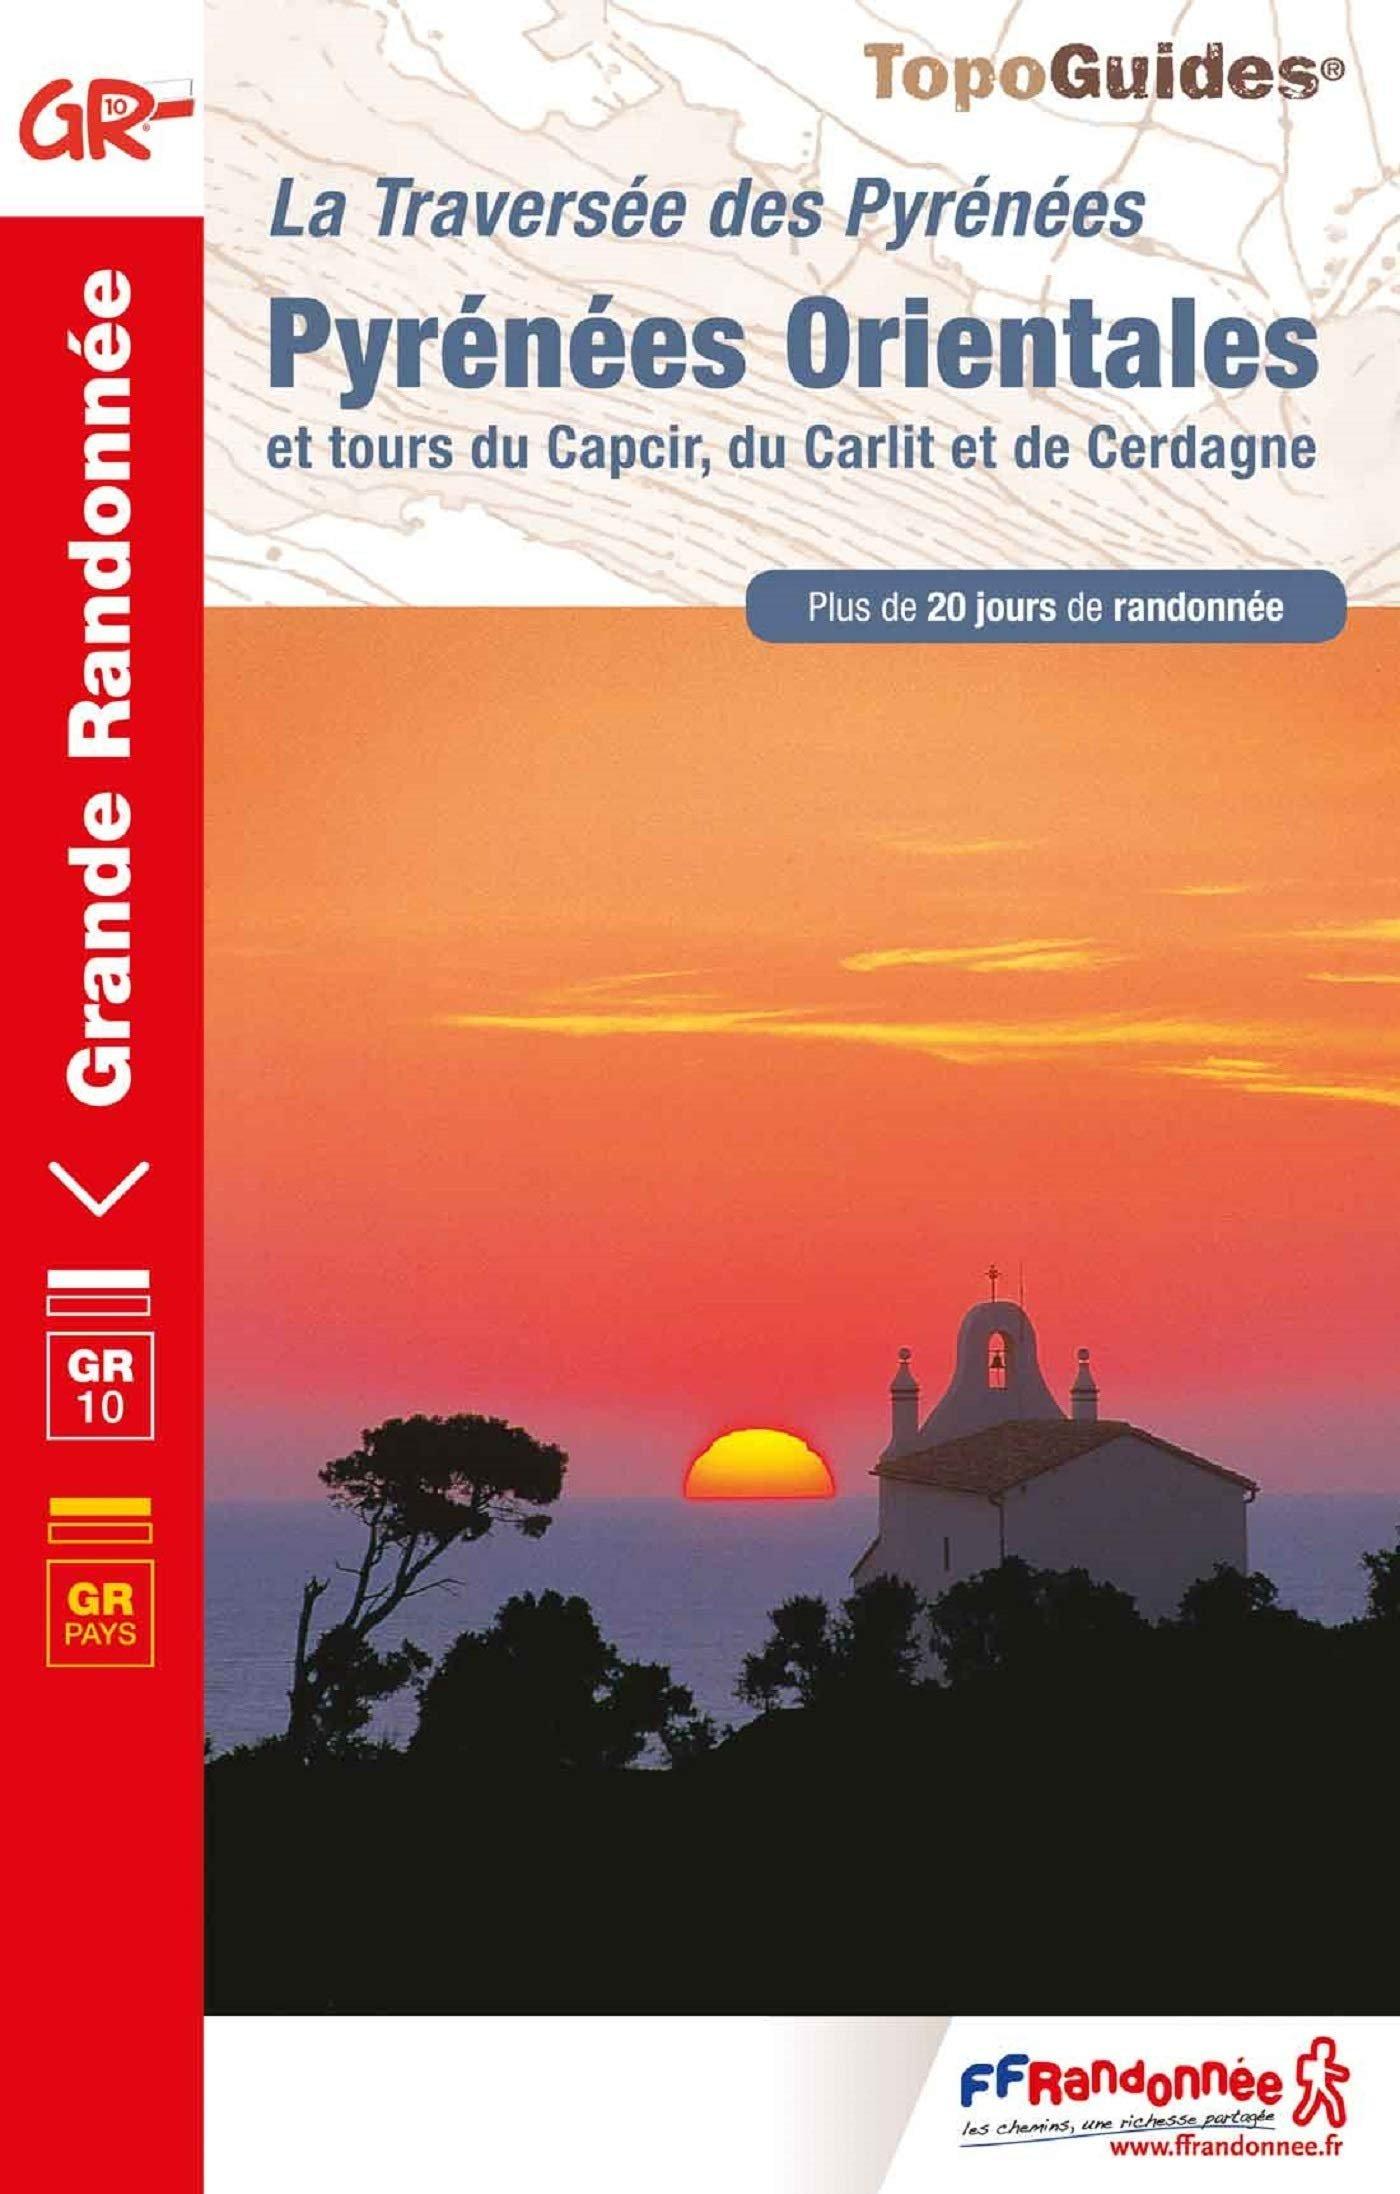 TG1092  Pyrénées Orientales (GR-10) 9782751410208  FFRP Topoguides  Meerdaagse wandelroutes, Wandelgidsen Franse Pyreneeën, Toulouse, Gers, Garonne